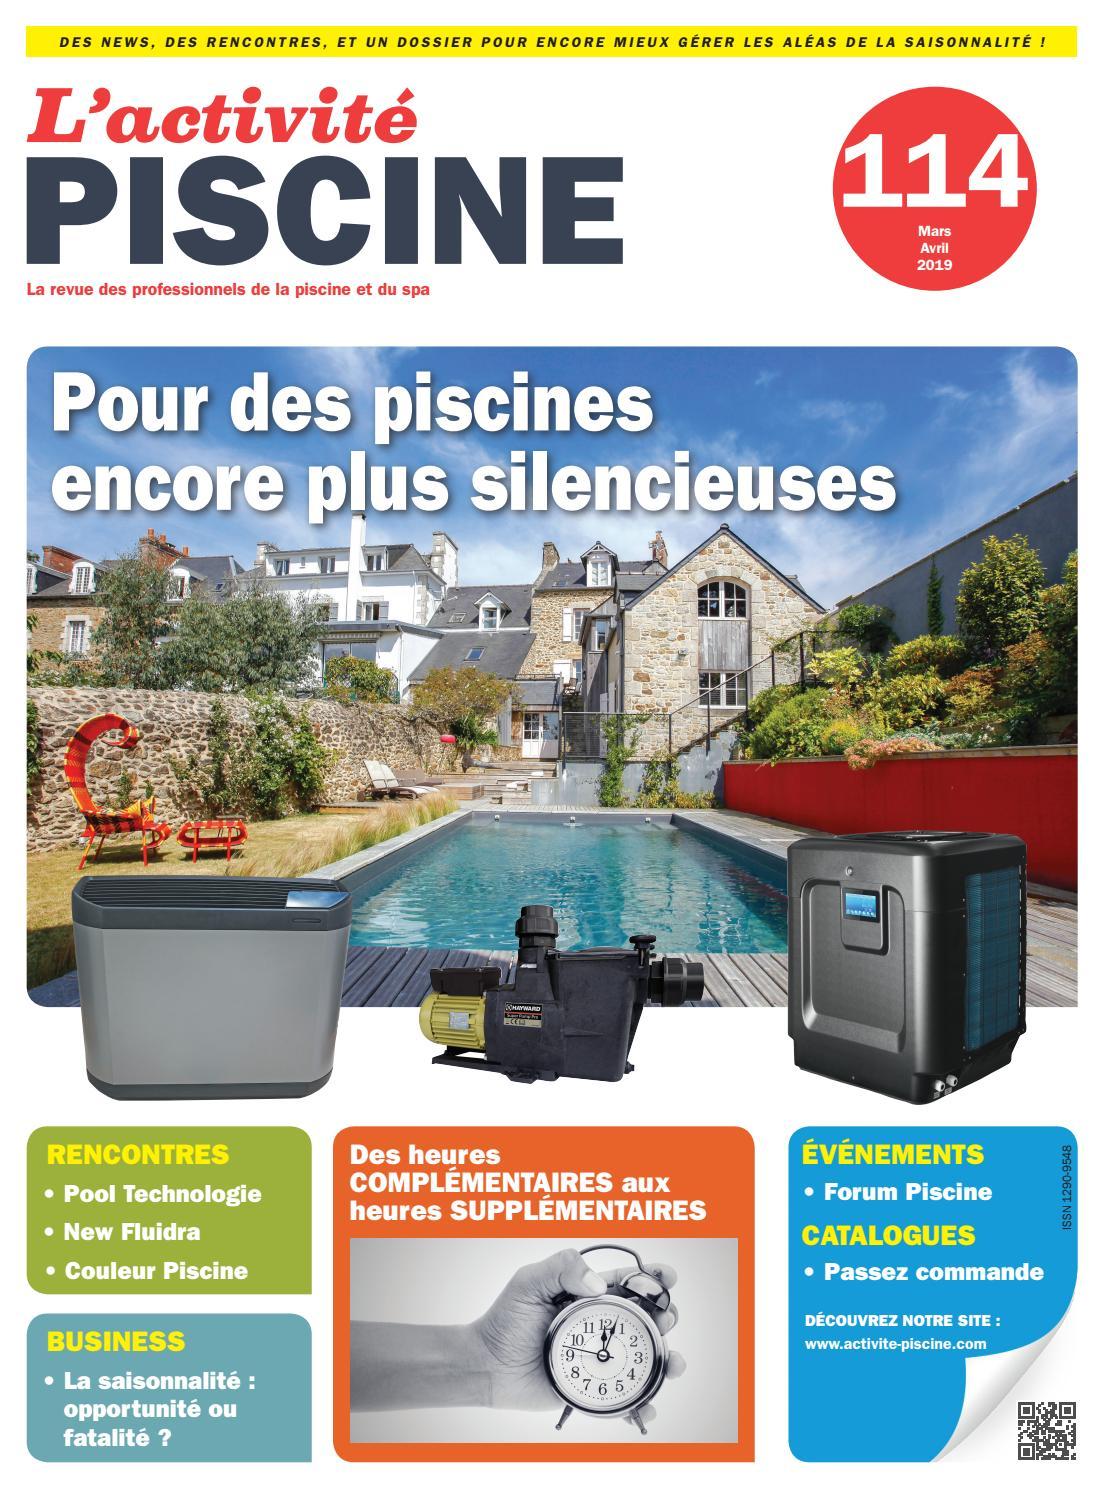 Prix Piscine Aquilus Mini Water l'activité piscine 114l'activité piscine - issuu